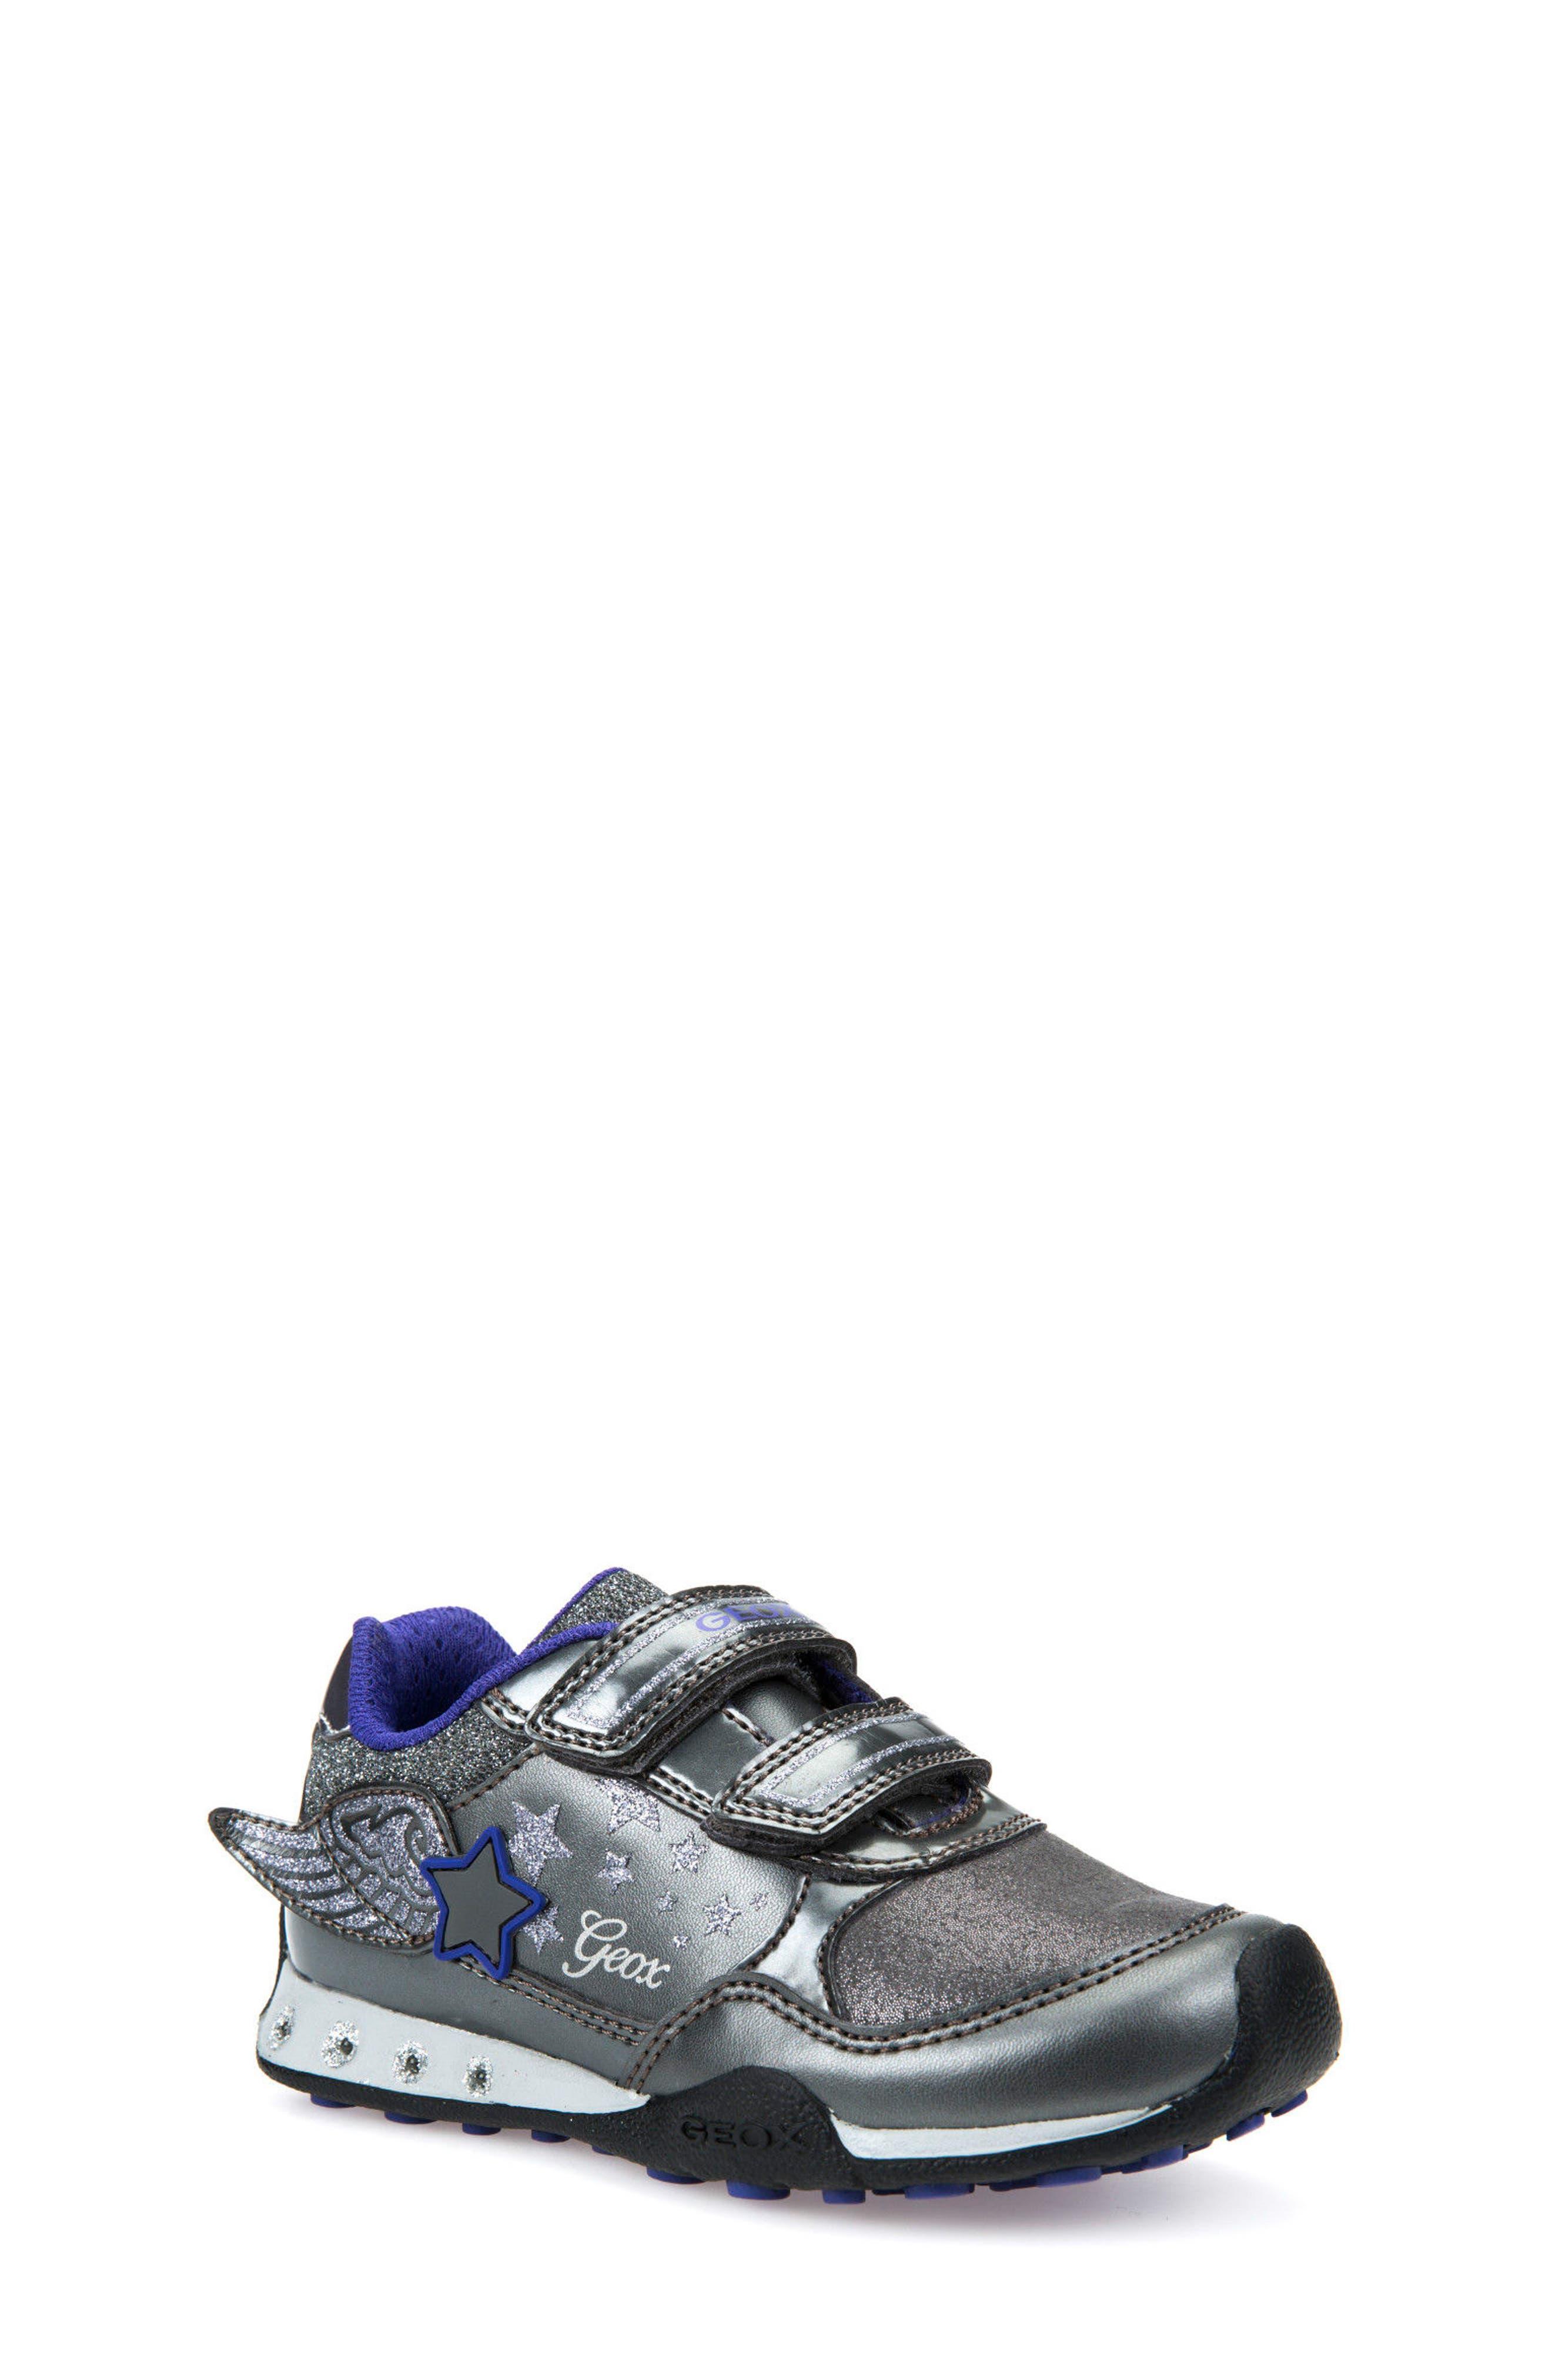 Geox New Jocker Winged Light-Up Sneaker (Toddler, Little Kid & Big Kid)